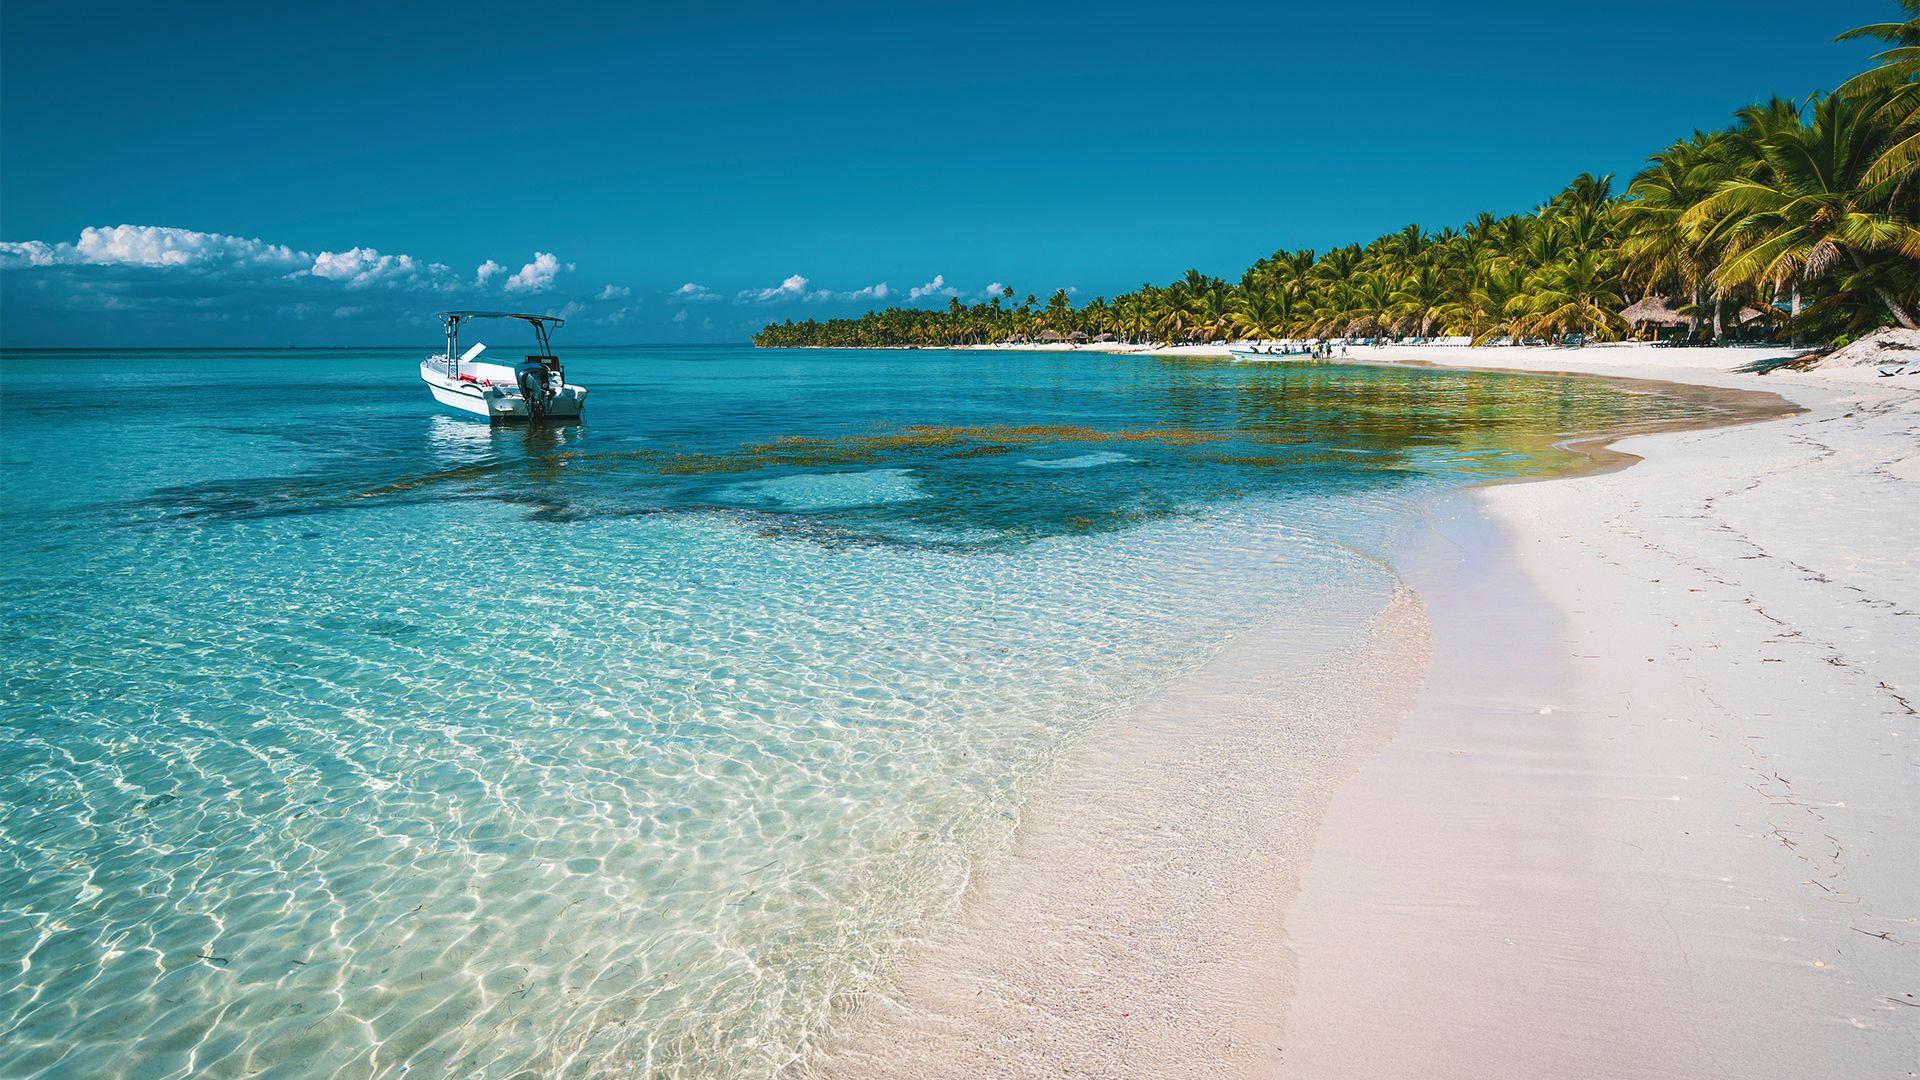 Sejur Plaja La Romana & Punta Cana, Republica Dominicana, 12 zile - septembrie 2021